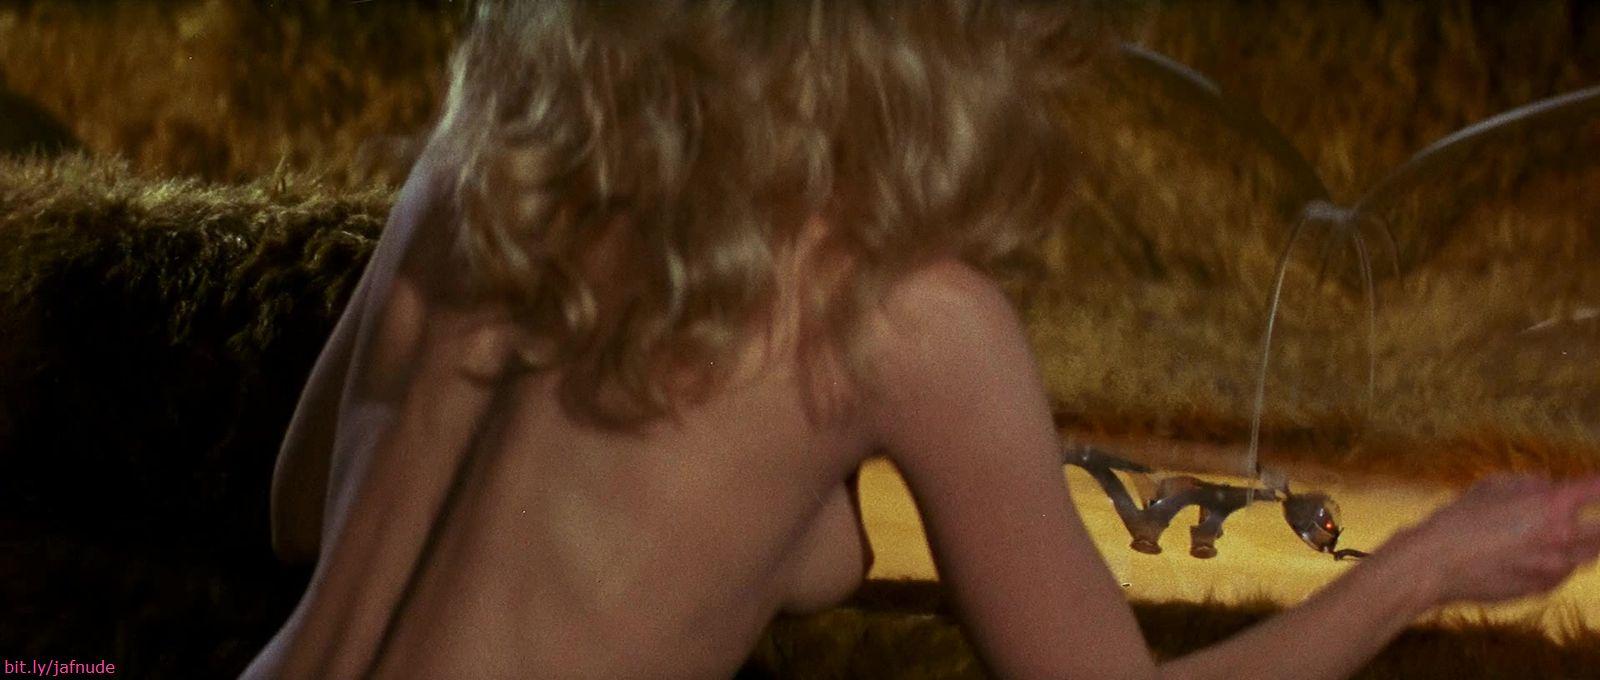 Jane Fonda Nude Pic 90